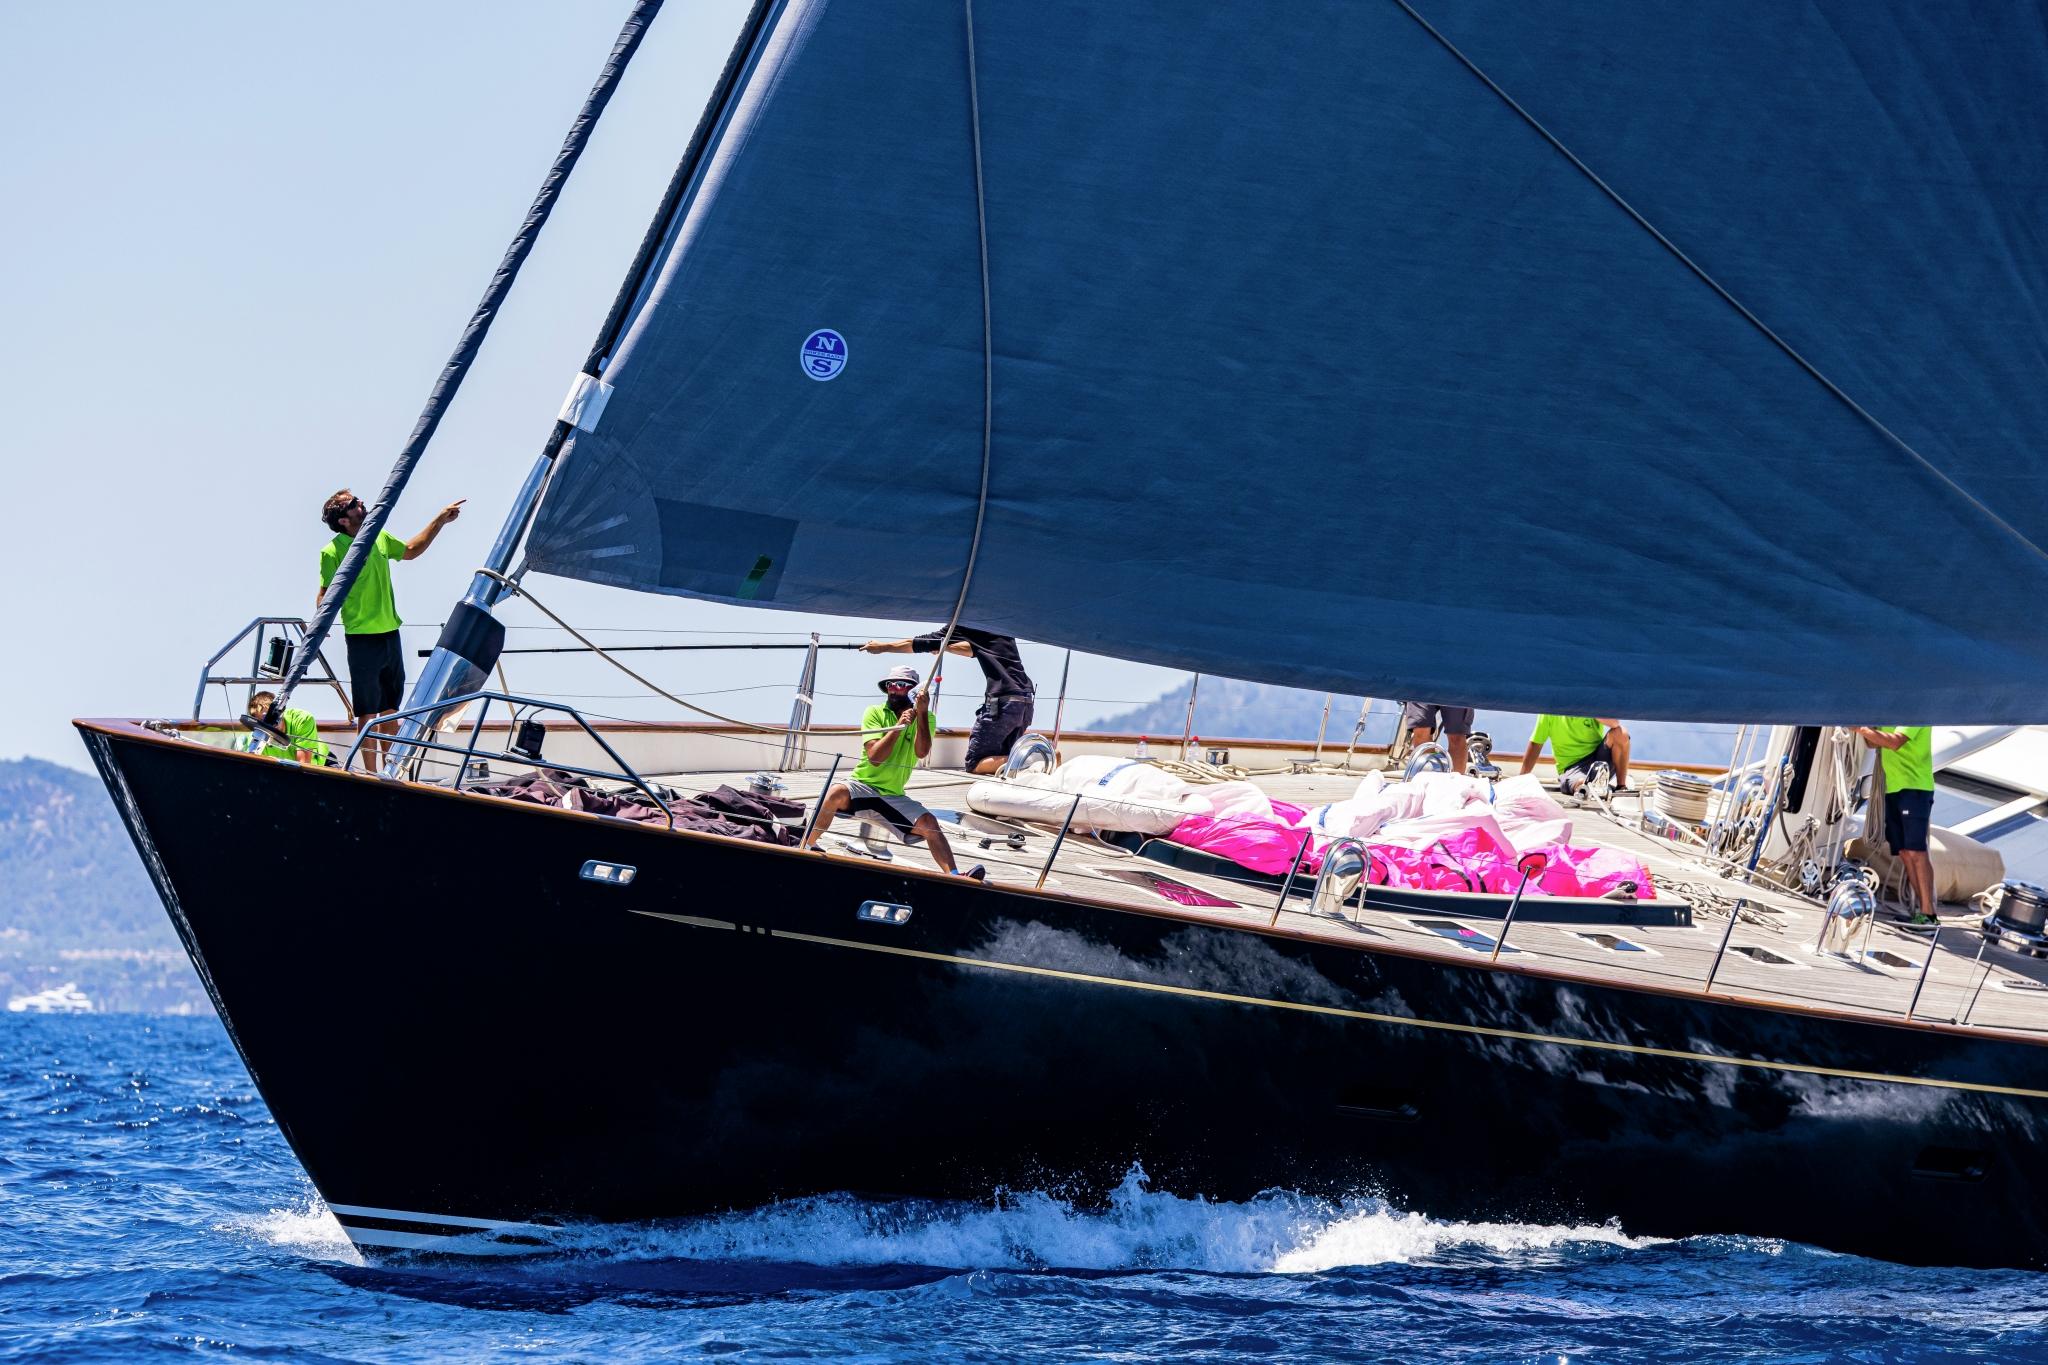 Superyacht Cup Palma 2021, a yacht prepares its kite.